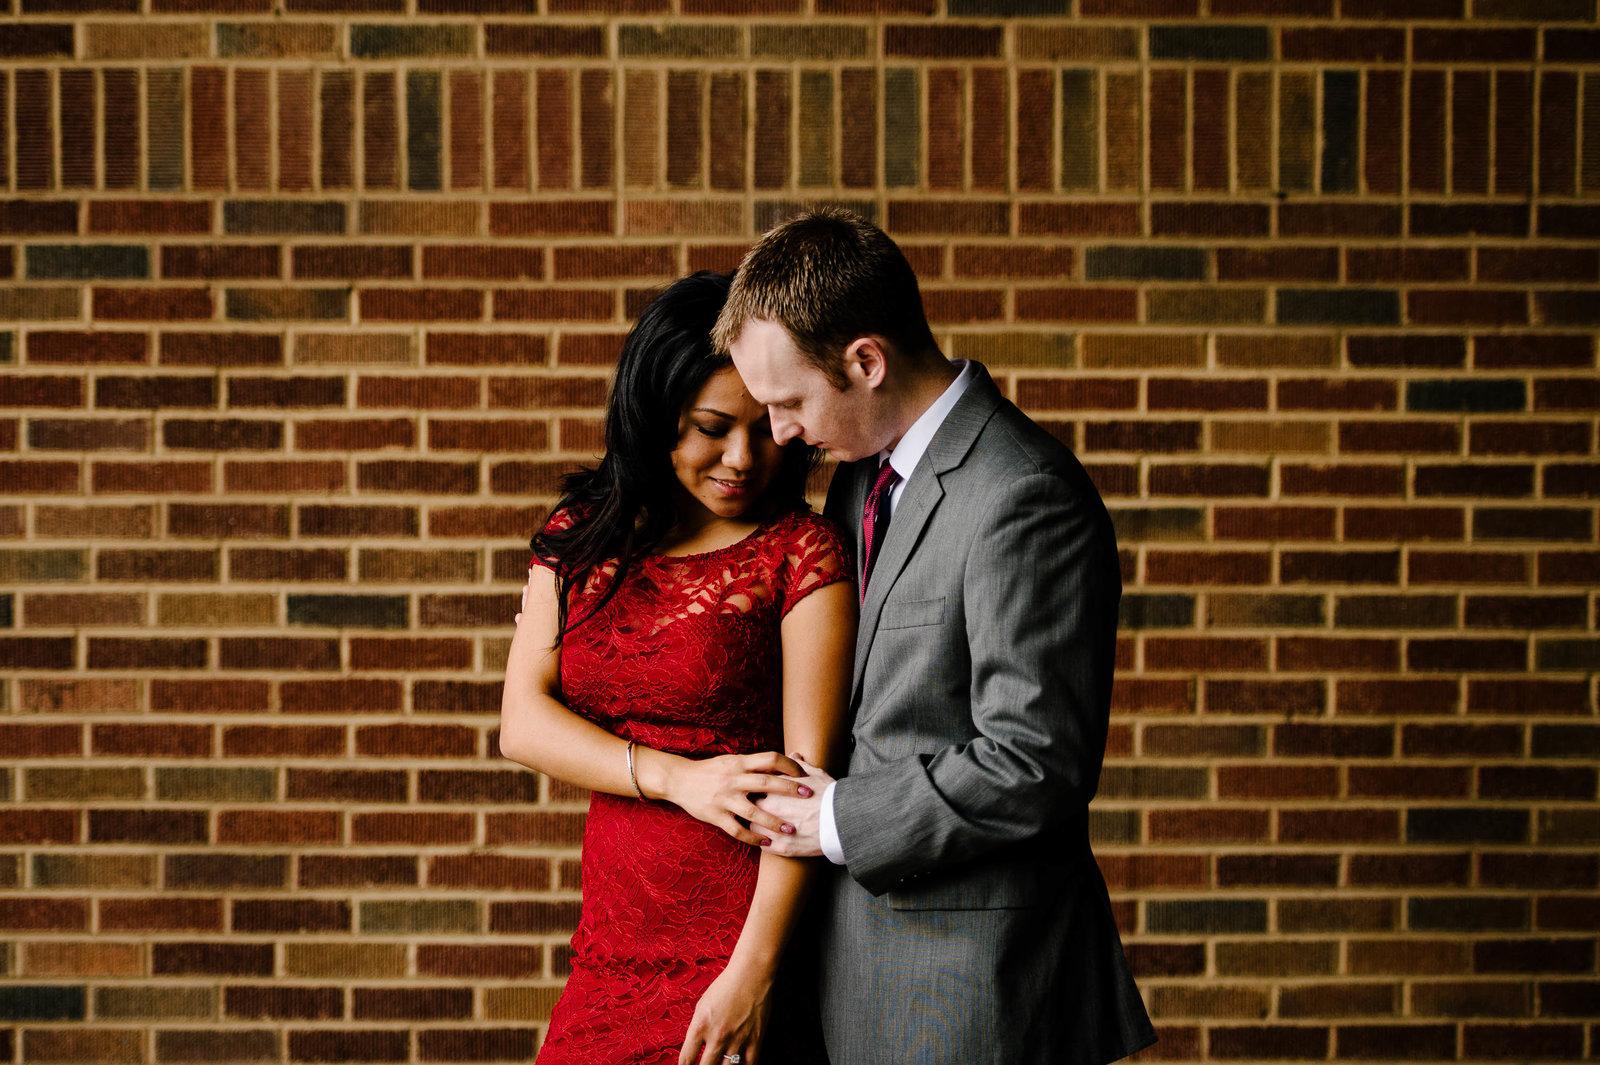 038-El-paso-wedding-photographer-JeMa_0036